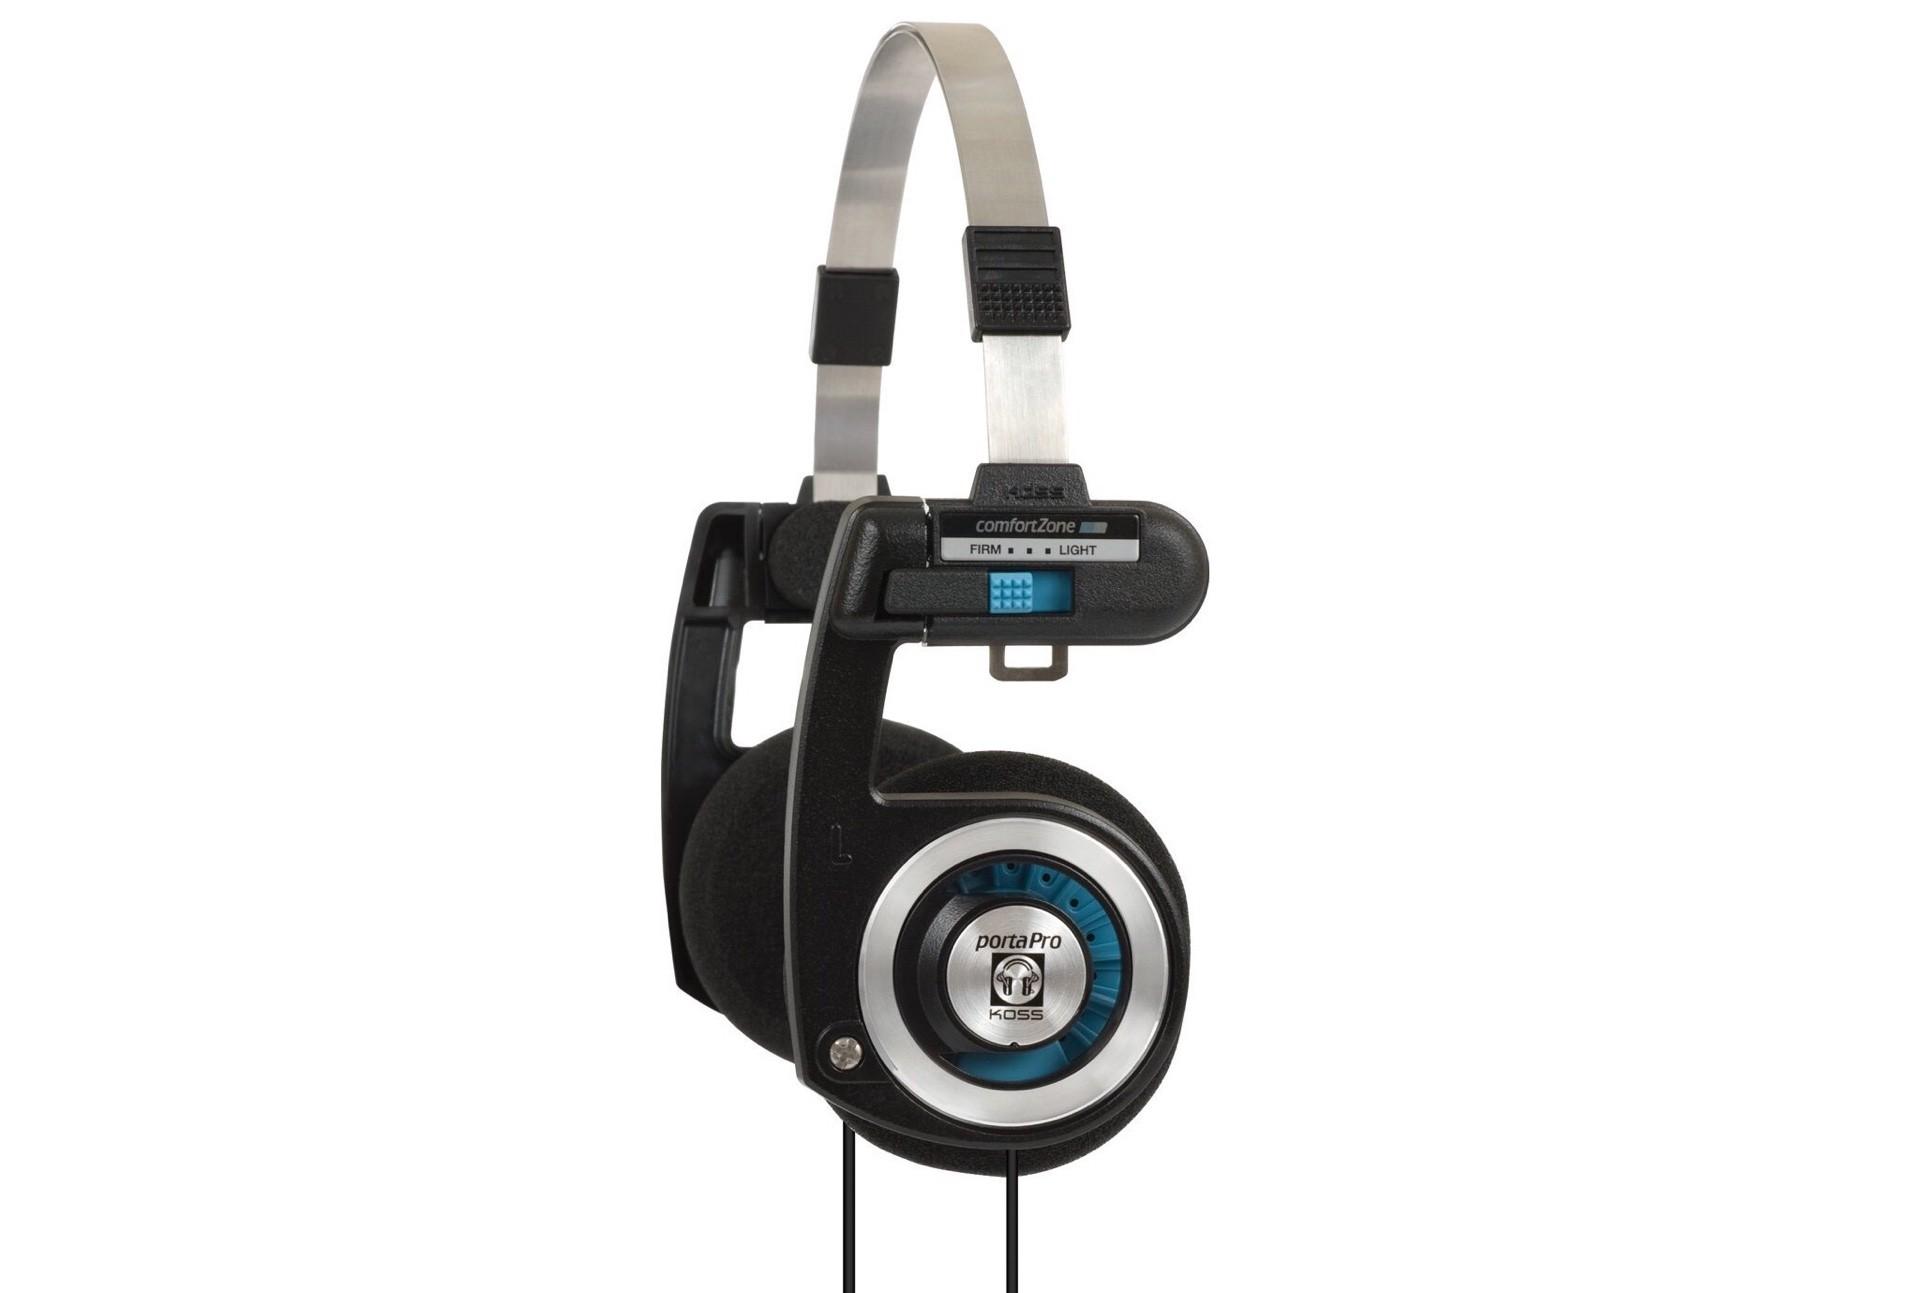 Koss Porta Pro headphones. ($34)